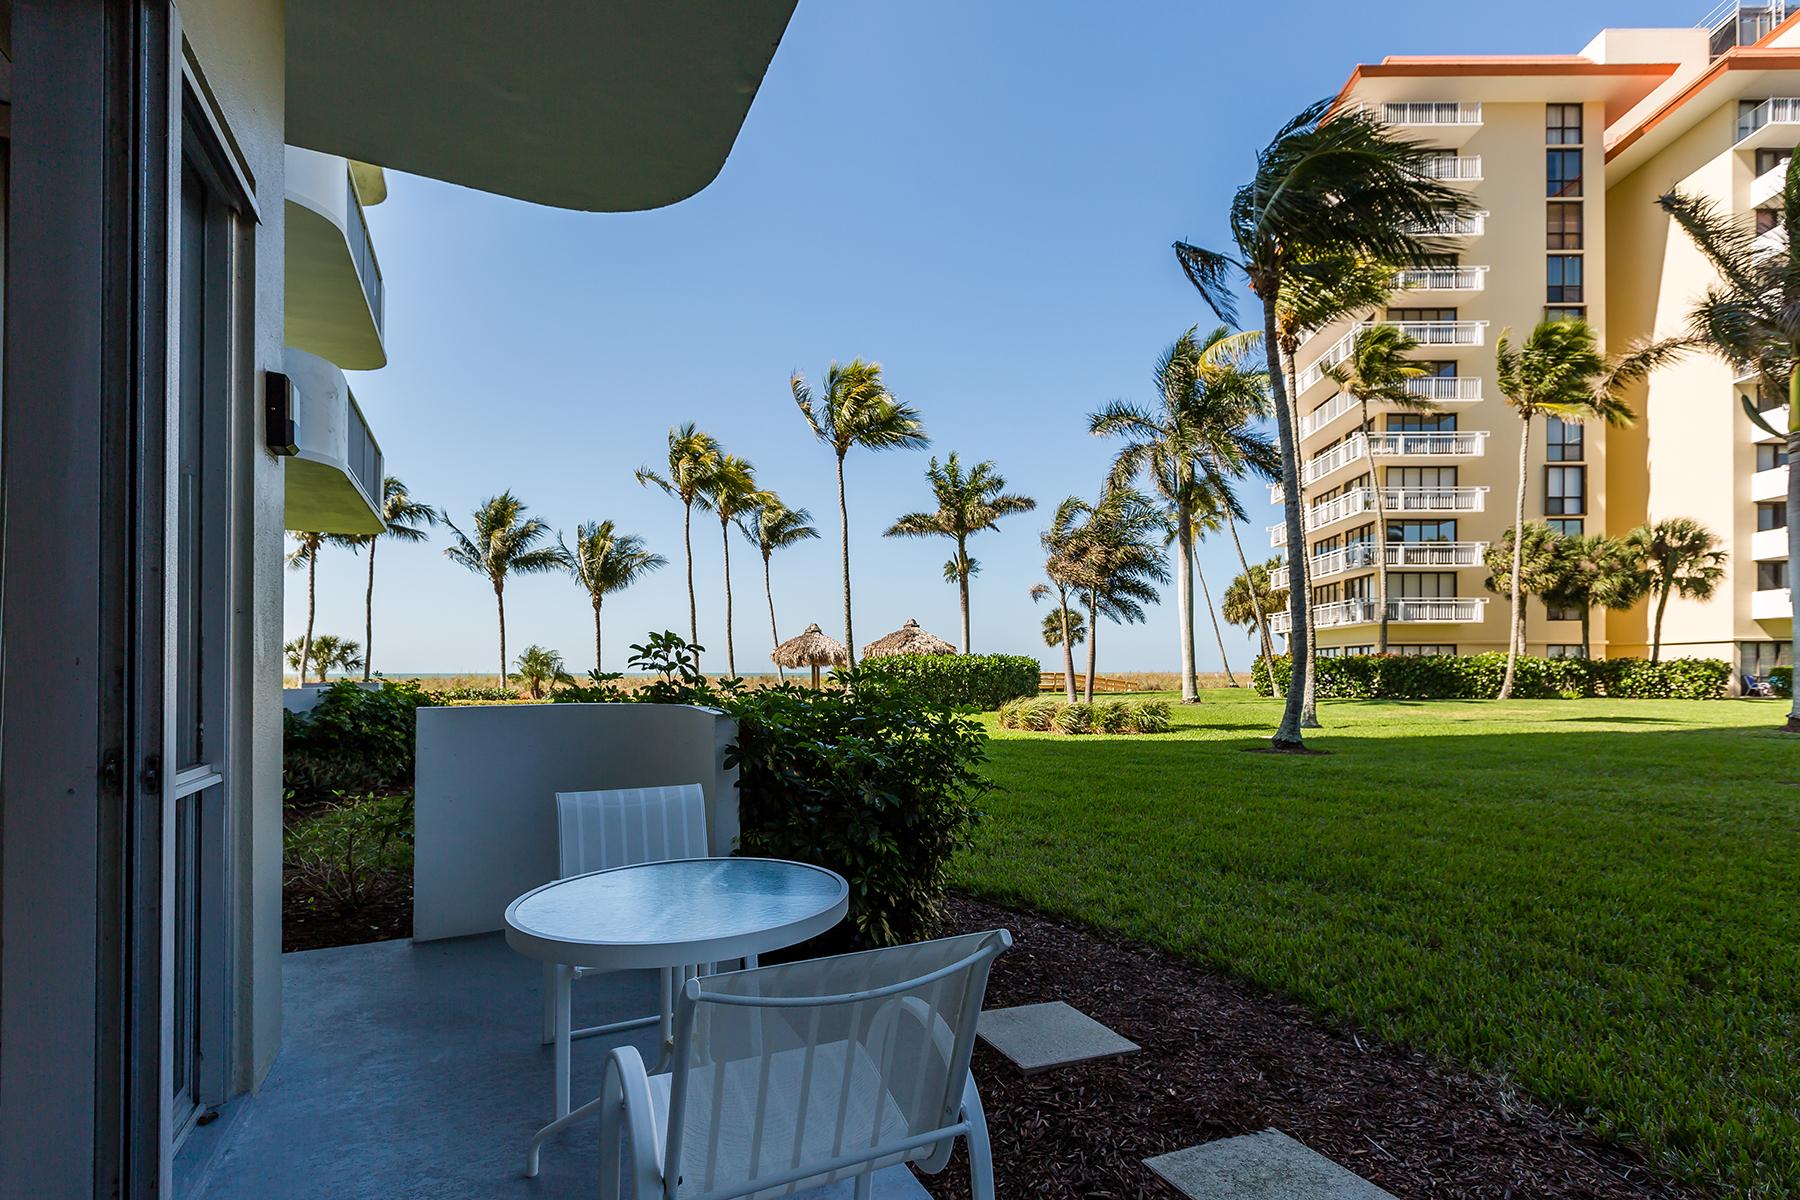 Condomínio para Venda às MARCO ISLAND 140 Seaview Ct N-106 Marco Island, Florida, 34145 Estados Unidos